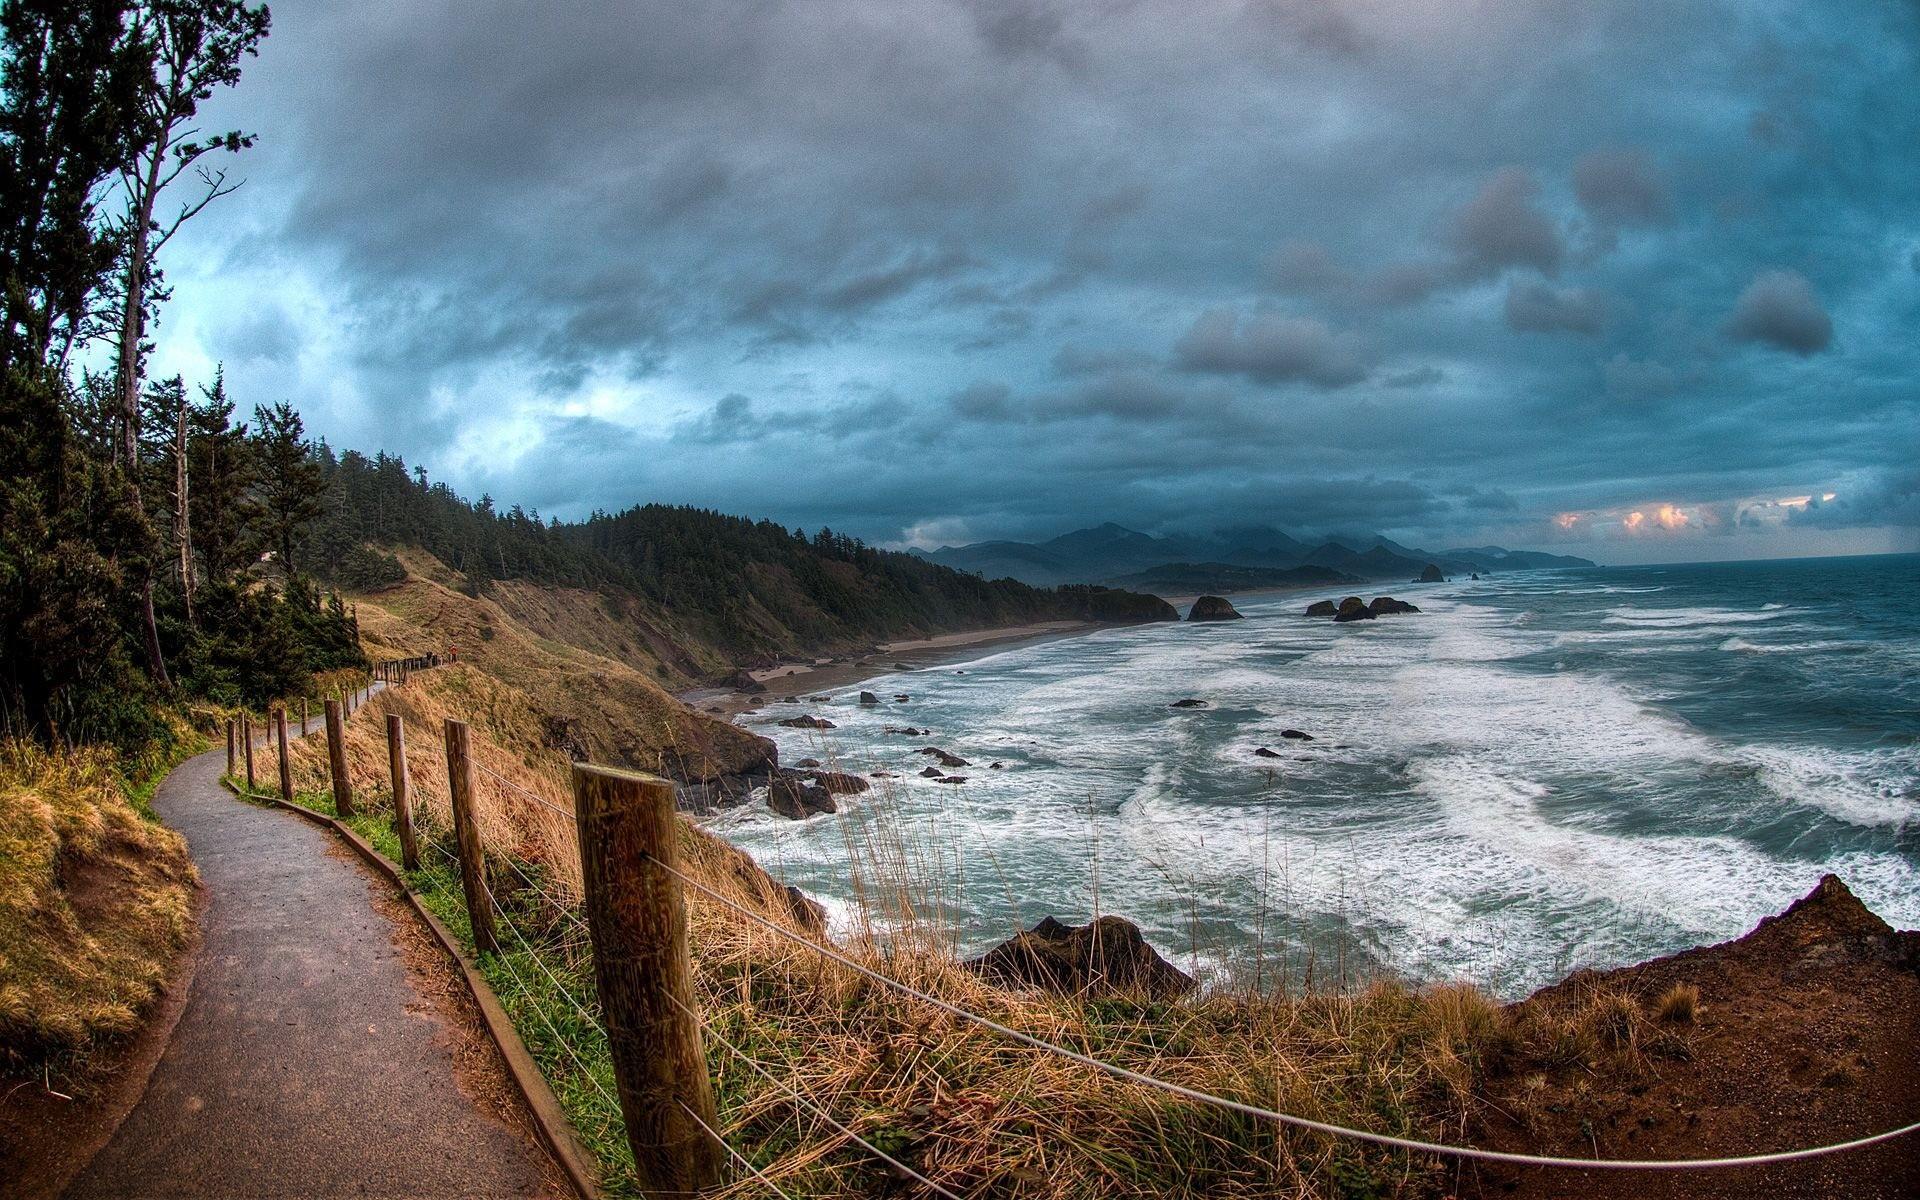 Ocean Landscape Wallpapers HD Pictures   Live HD Wallpaper .